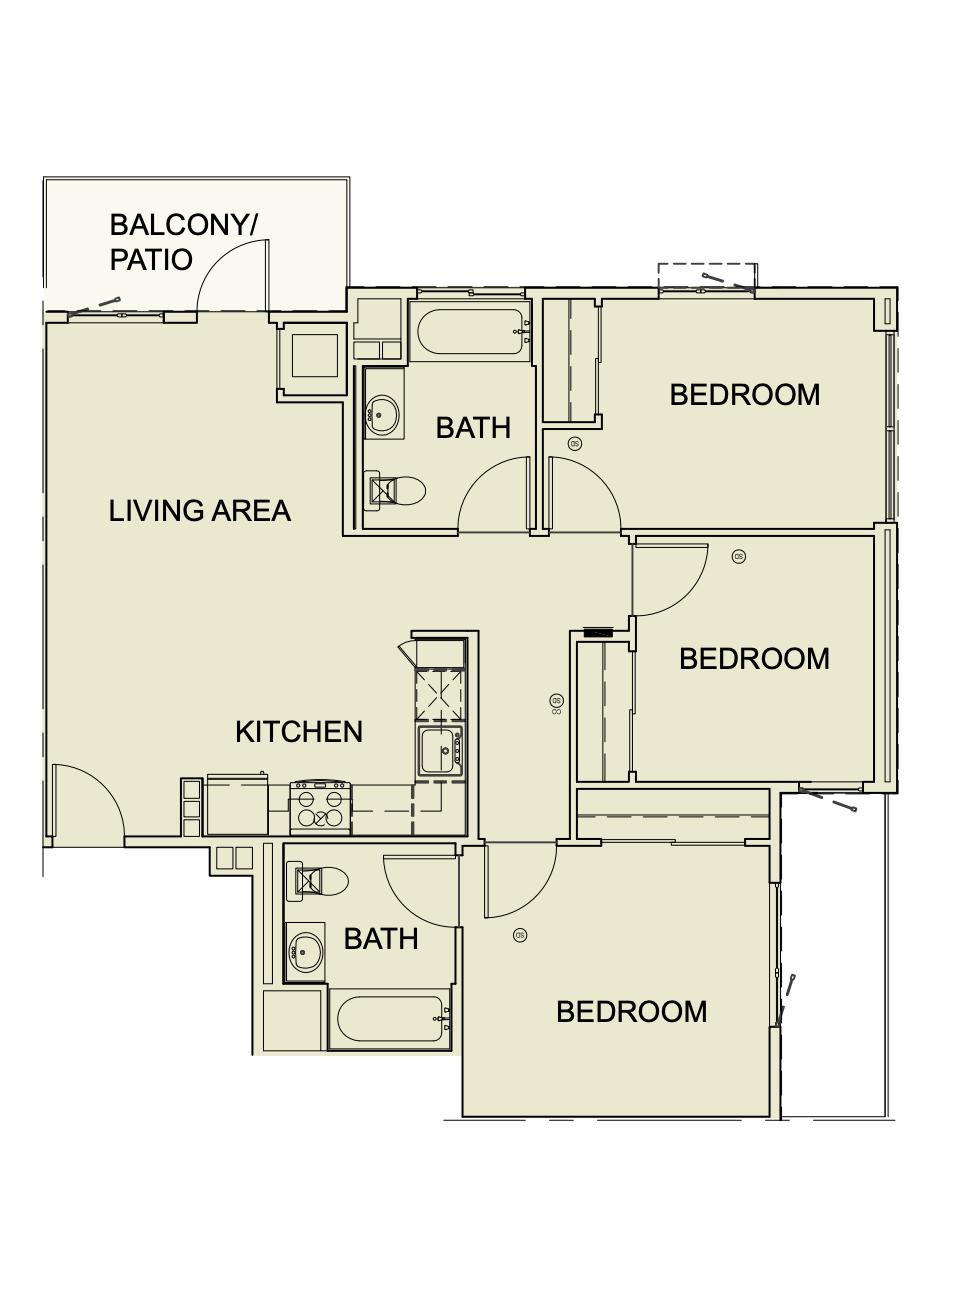 Three Bedroom/ Two Bath - 1035 SF Unit type c4